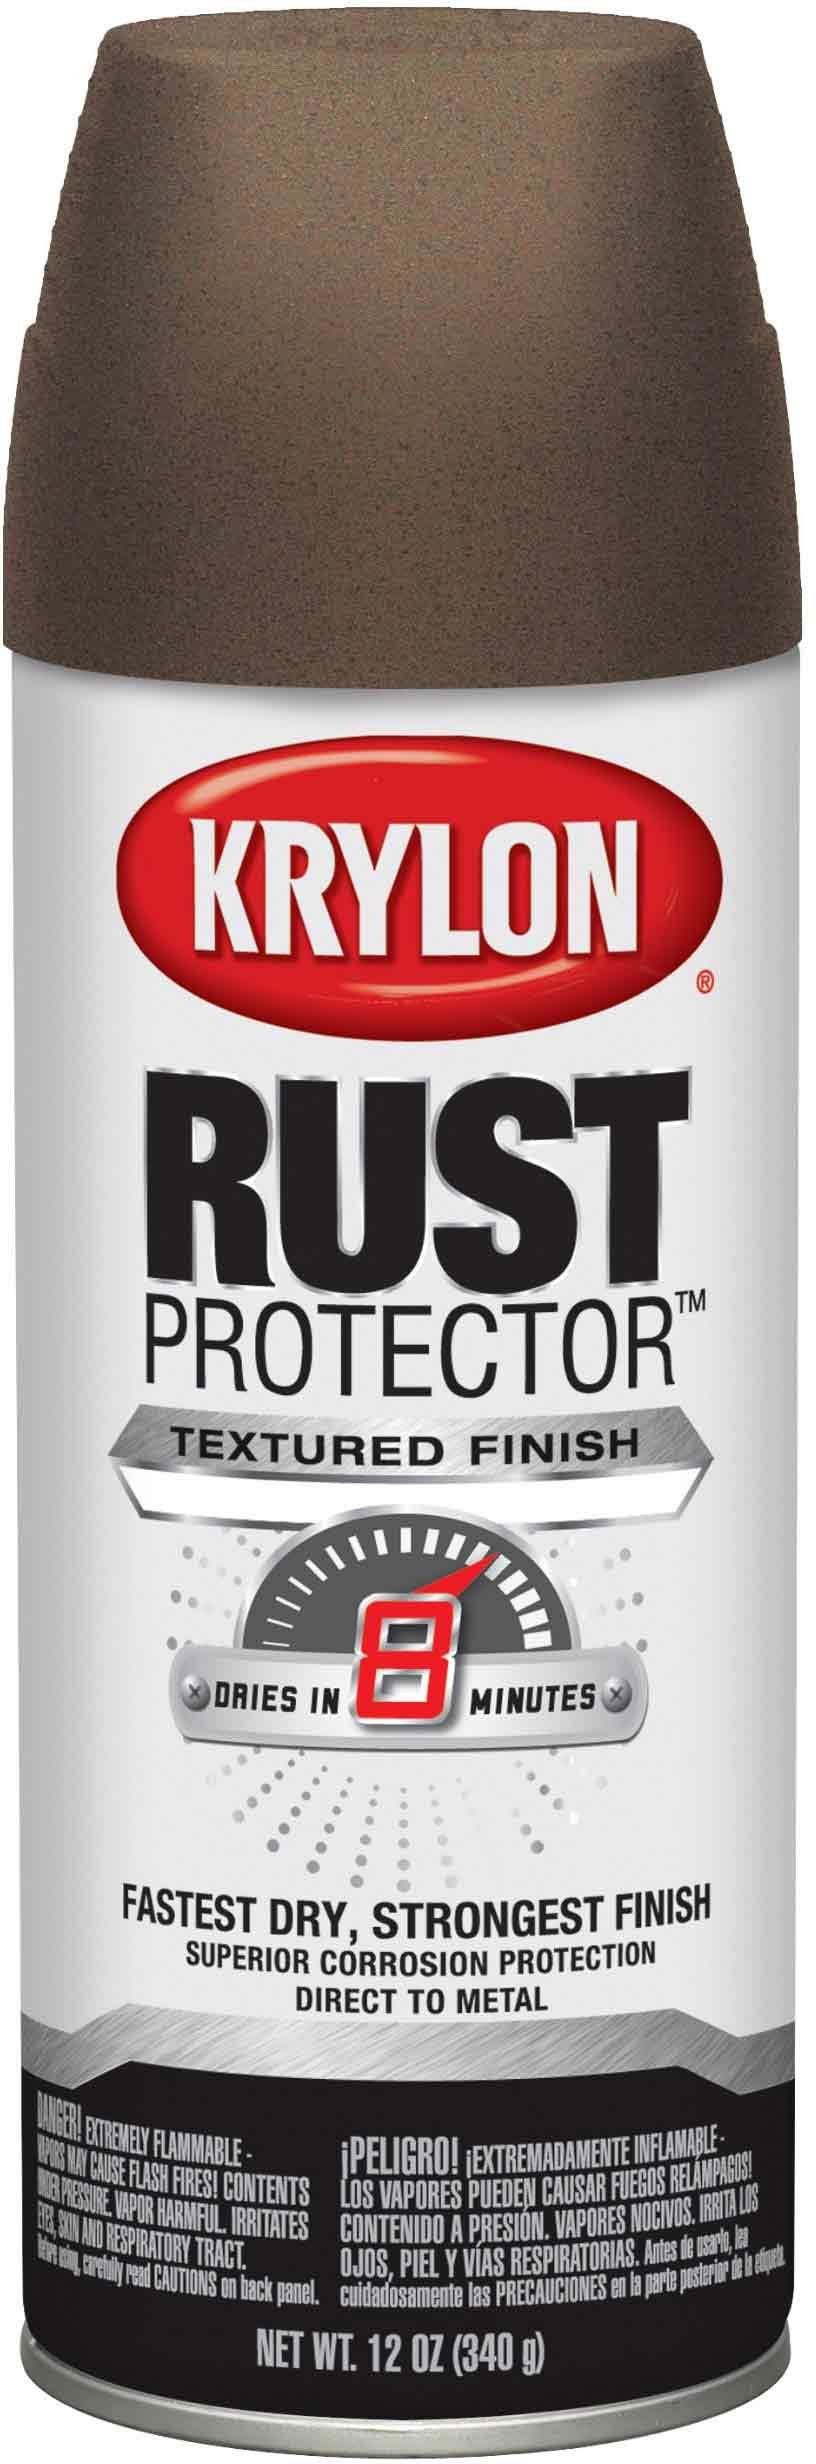 Krylon K06931600 Rust Protector Textured Paint, Dark Bronze